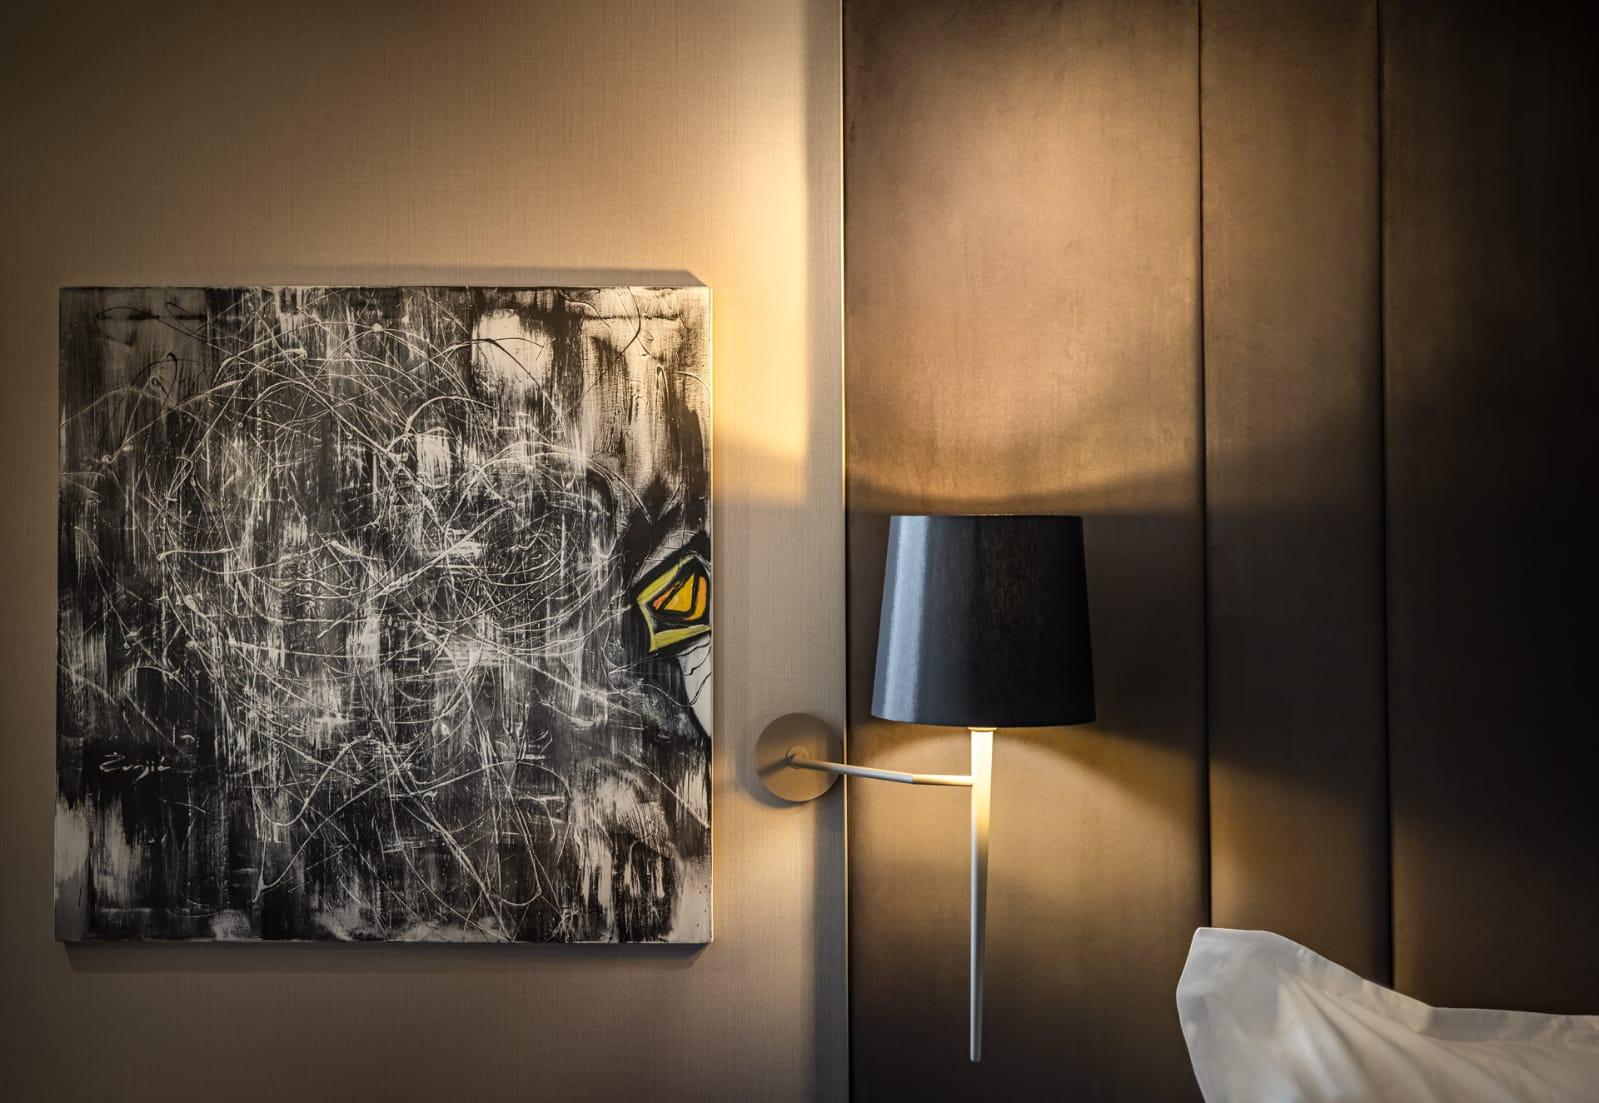 Linea Milanovic hotel grand adriatic detalj